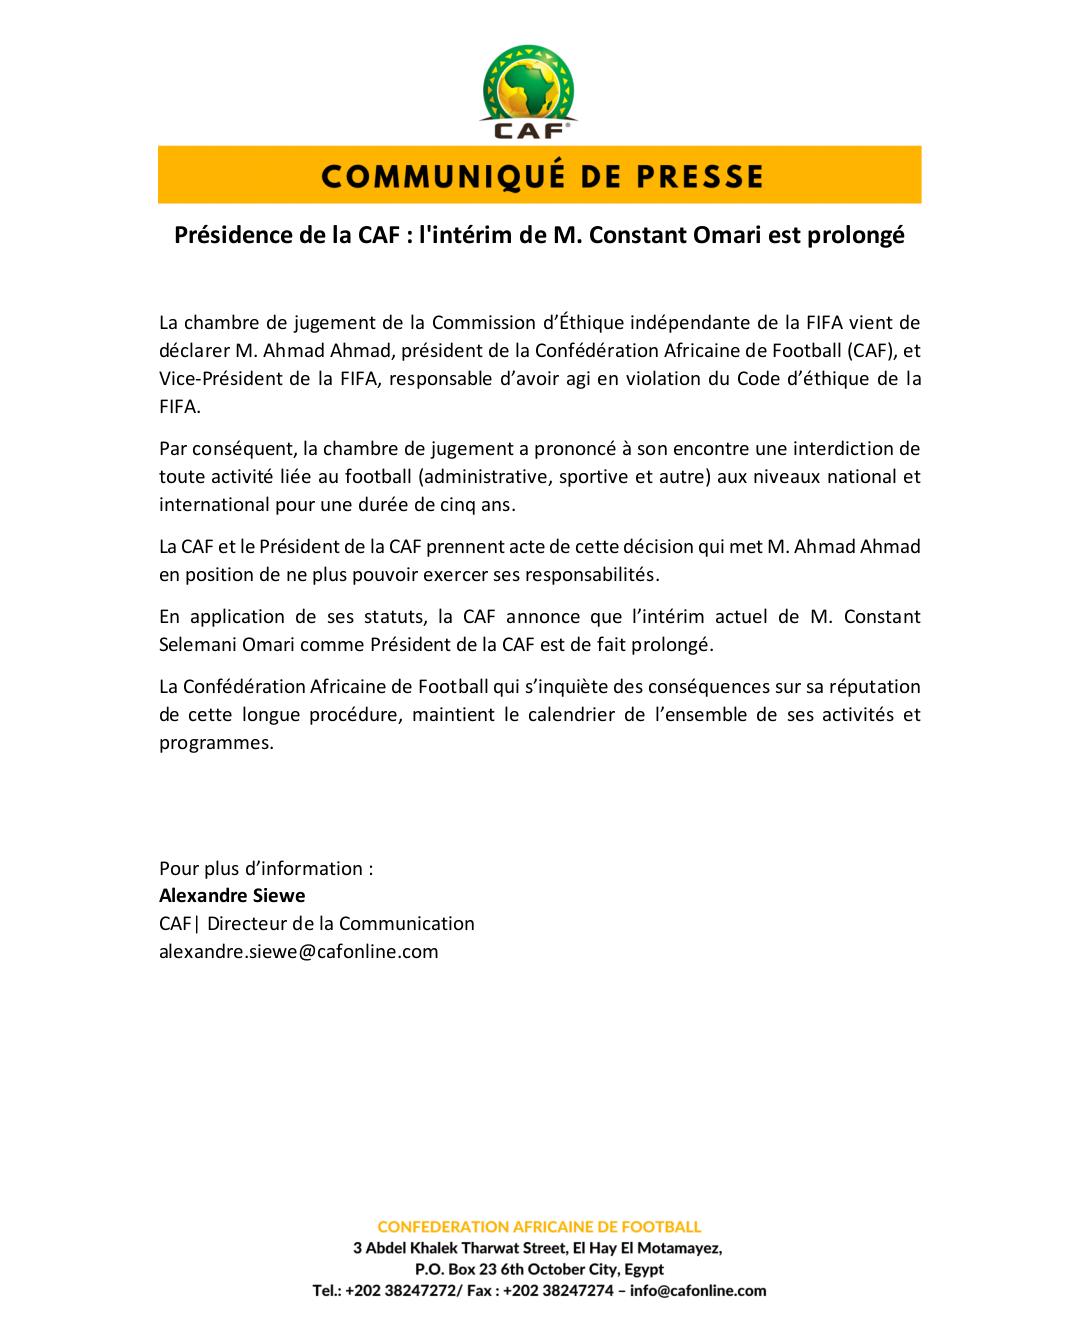 Présidence de la CAF : conséquences de la suspension d'Ahamd Ahmad, Constant Omari continue l'intérim (document)